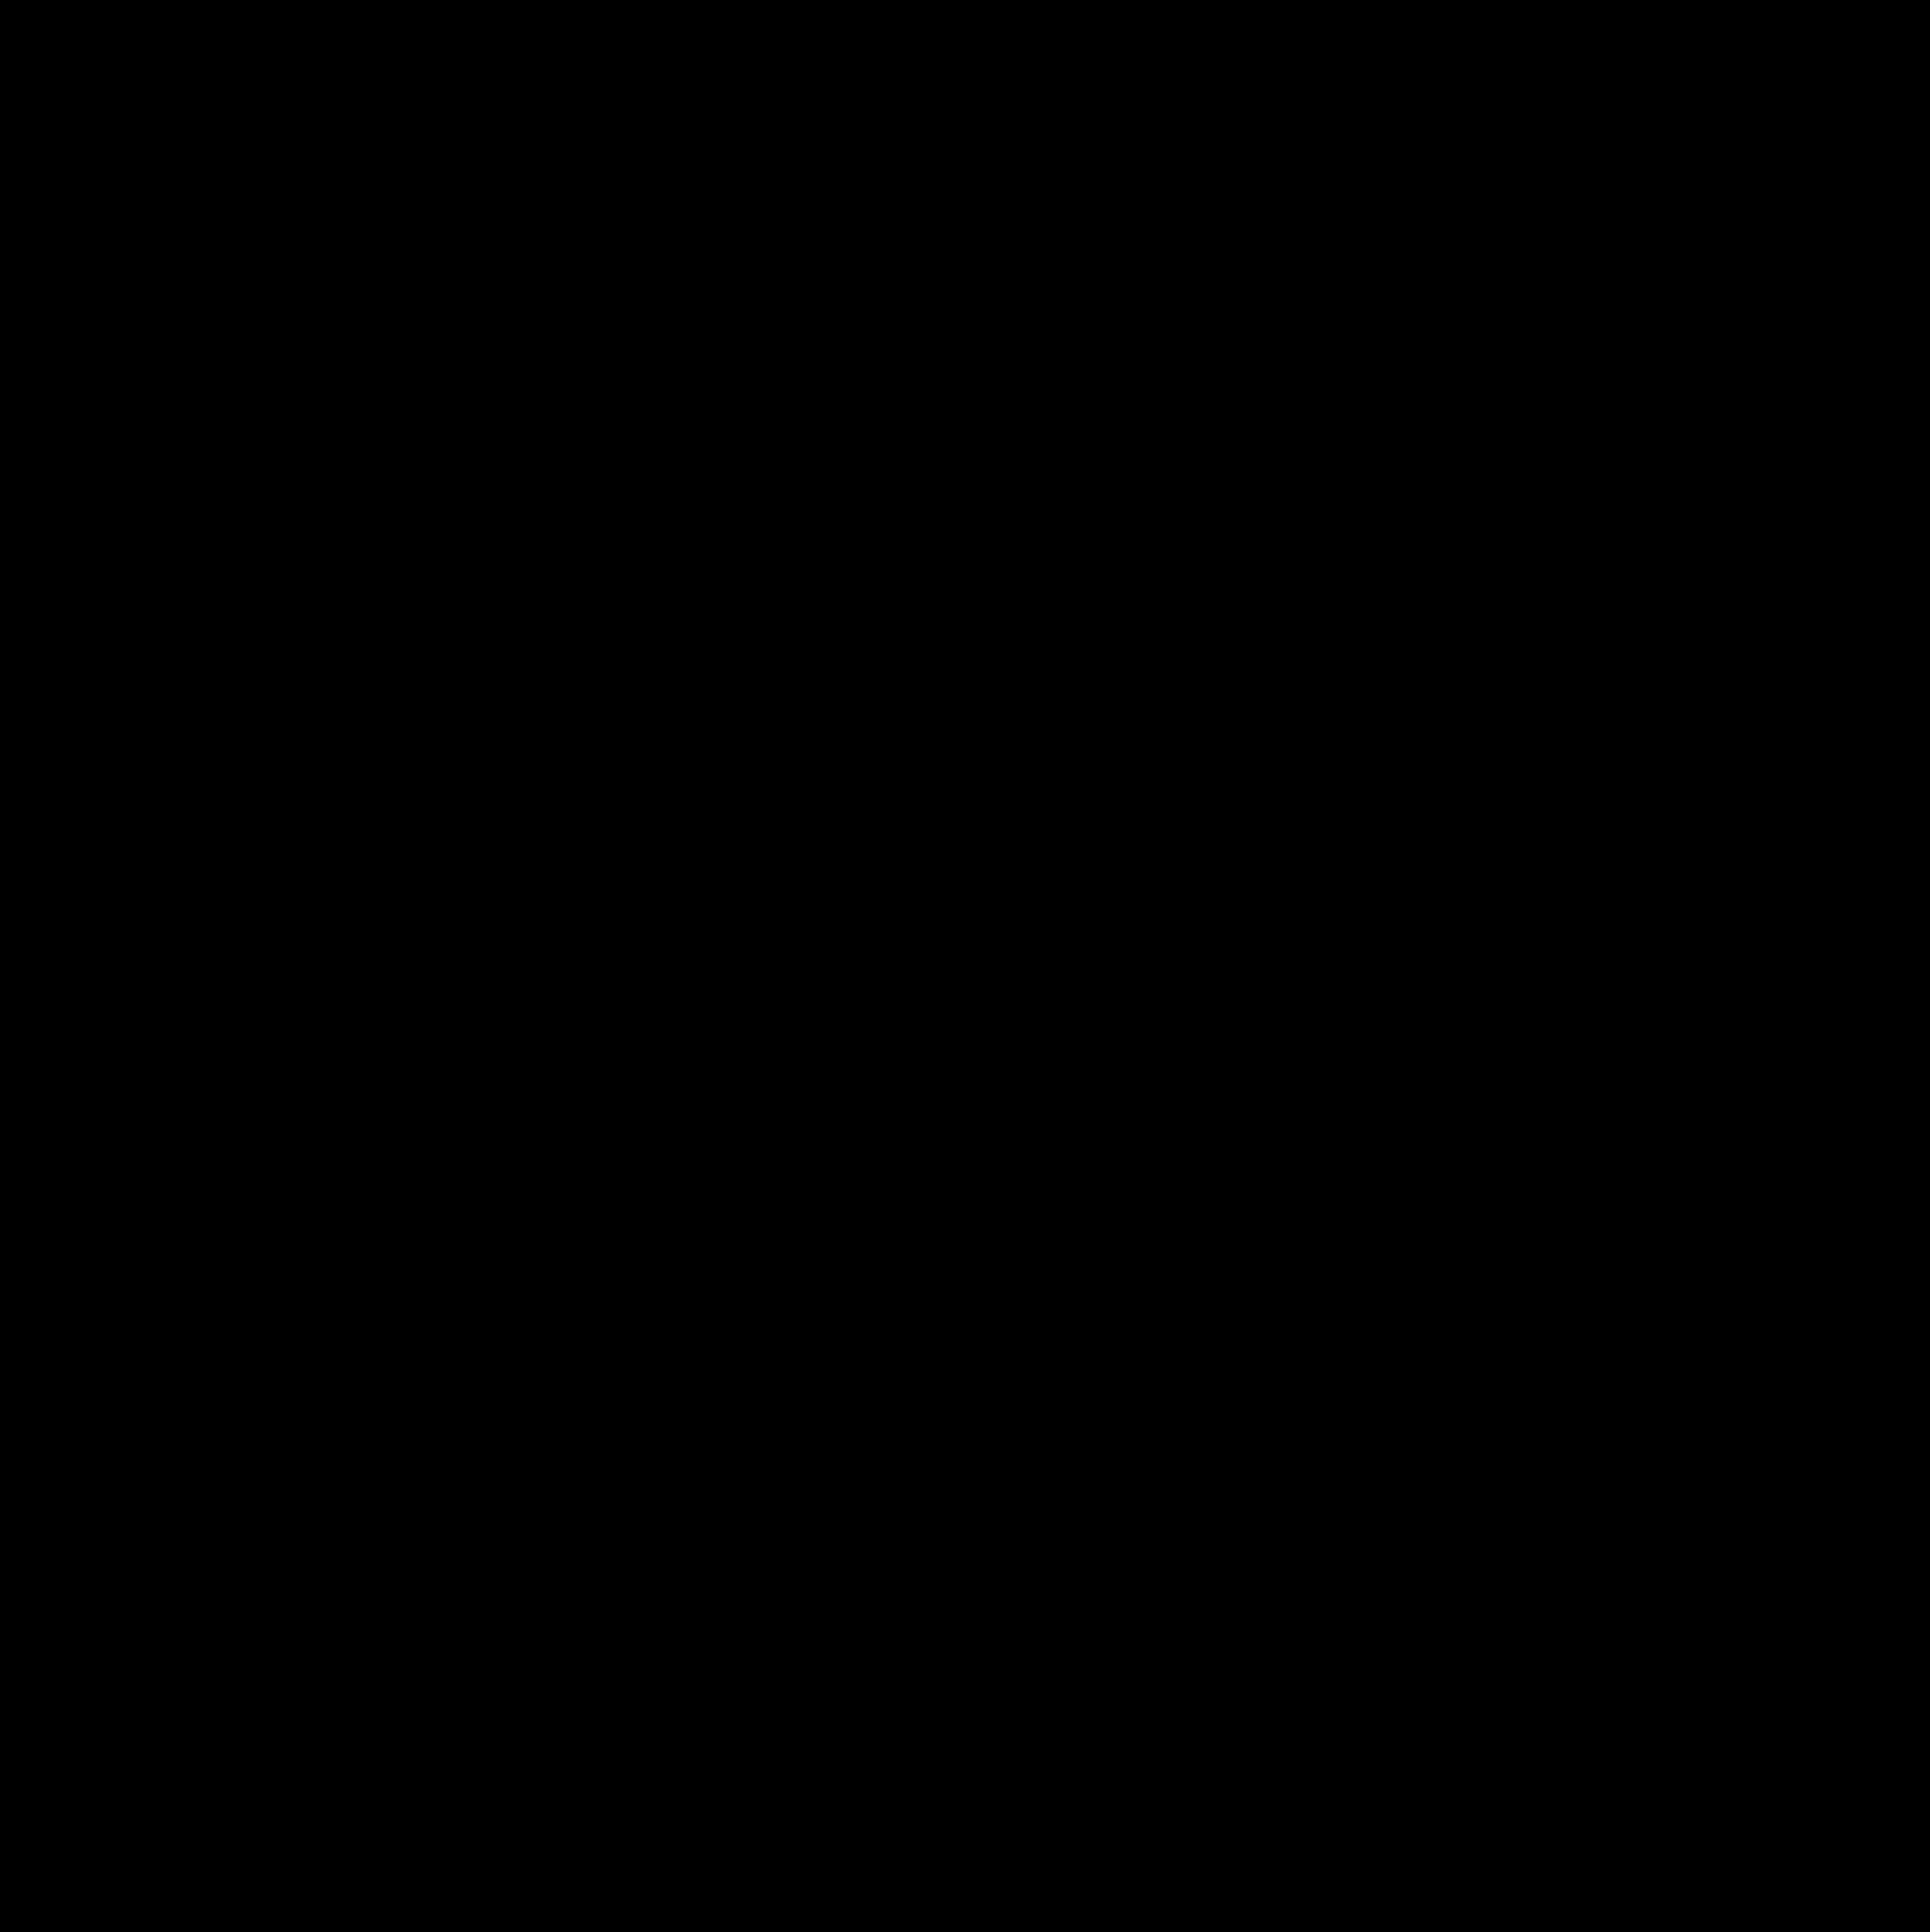 2020 IFMA網上虛擬錦標賽 – Shadow Box